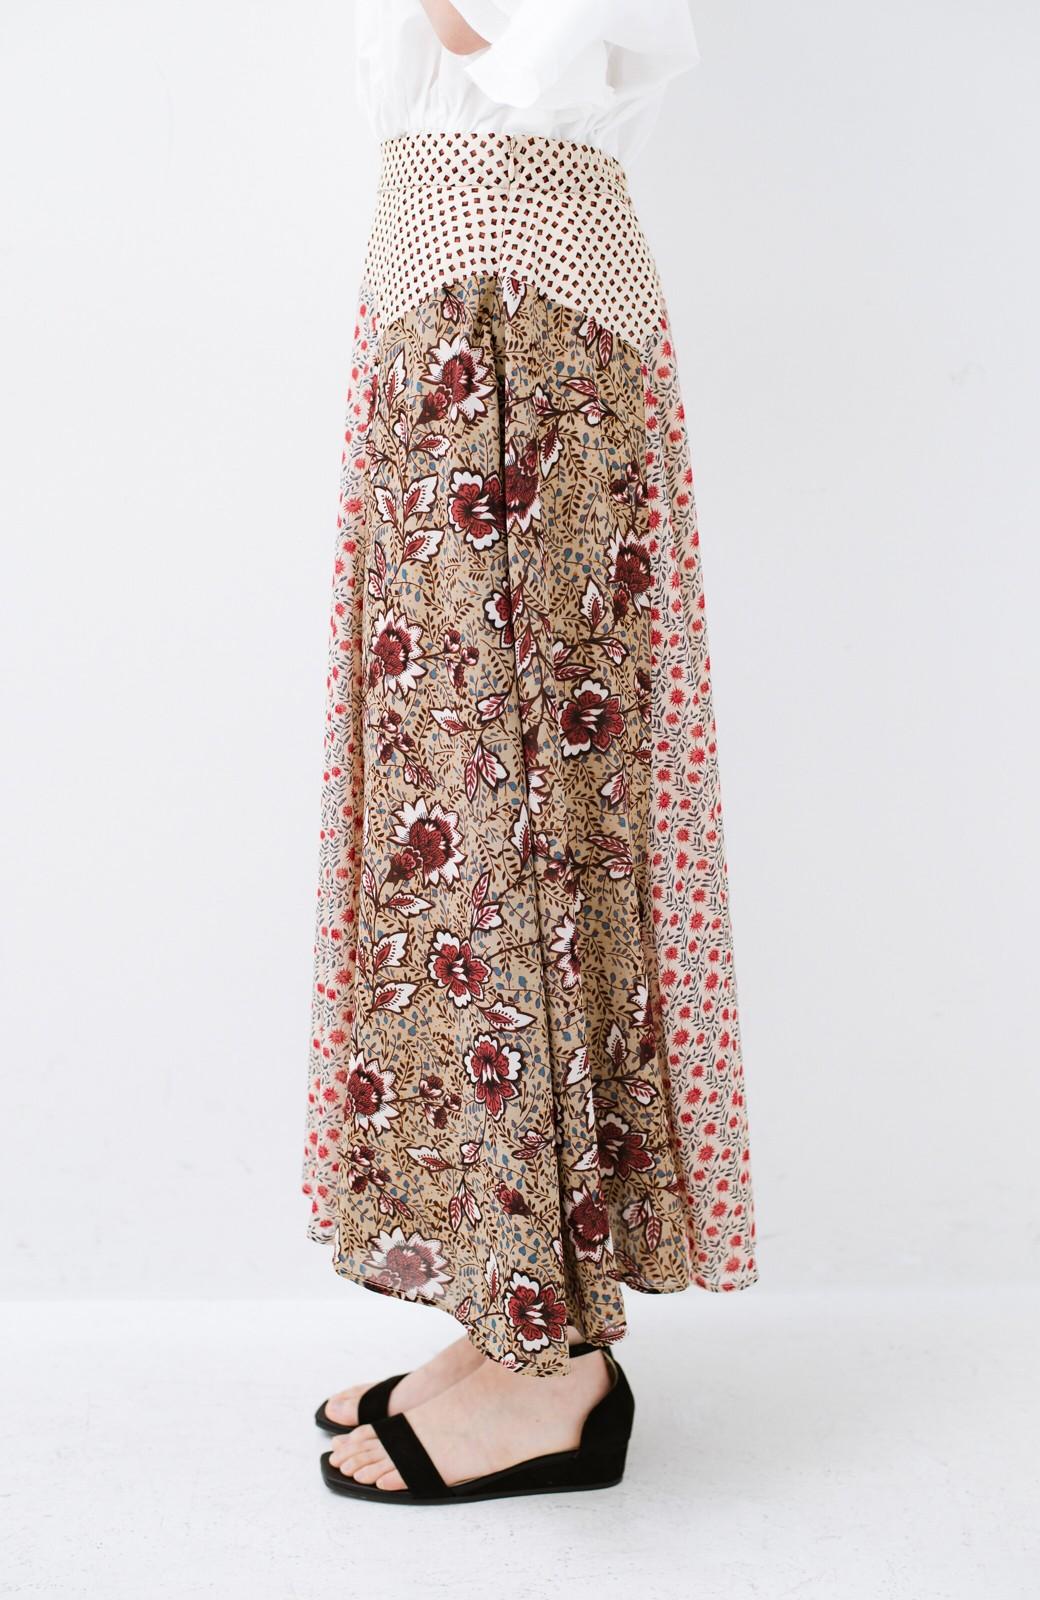 haco! 【洗濯機洗いOK】シンプルなトップスに合わせるだけでかわいくなれる MIX柄スカート <ベージュ系その他>の商品写真6